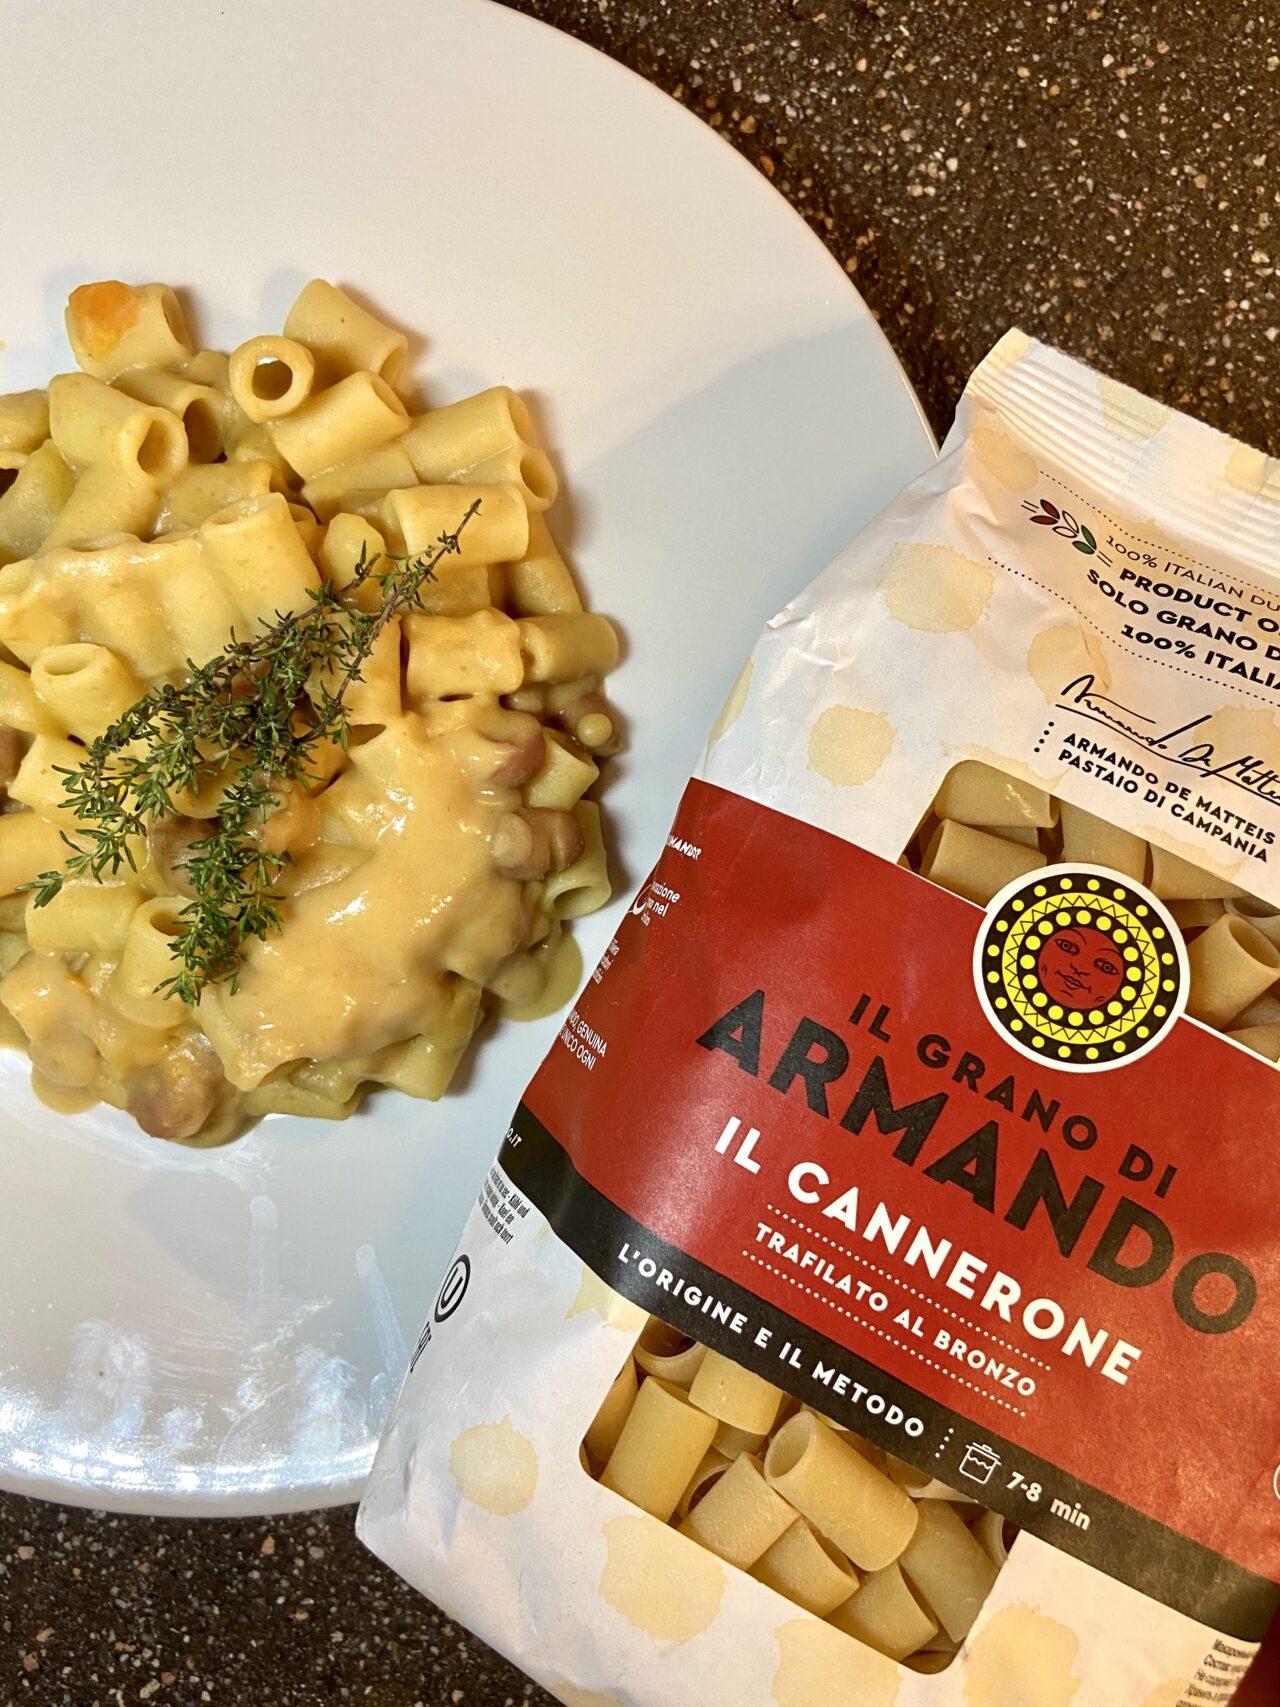 Ricetta Cannerone Pasta Armando patate fagioli unastellaincucina 1